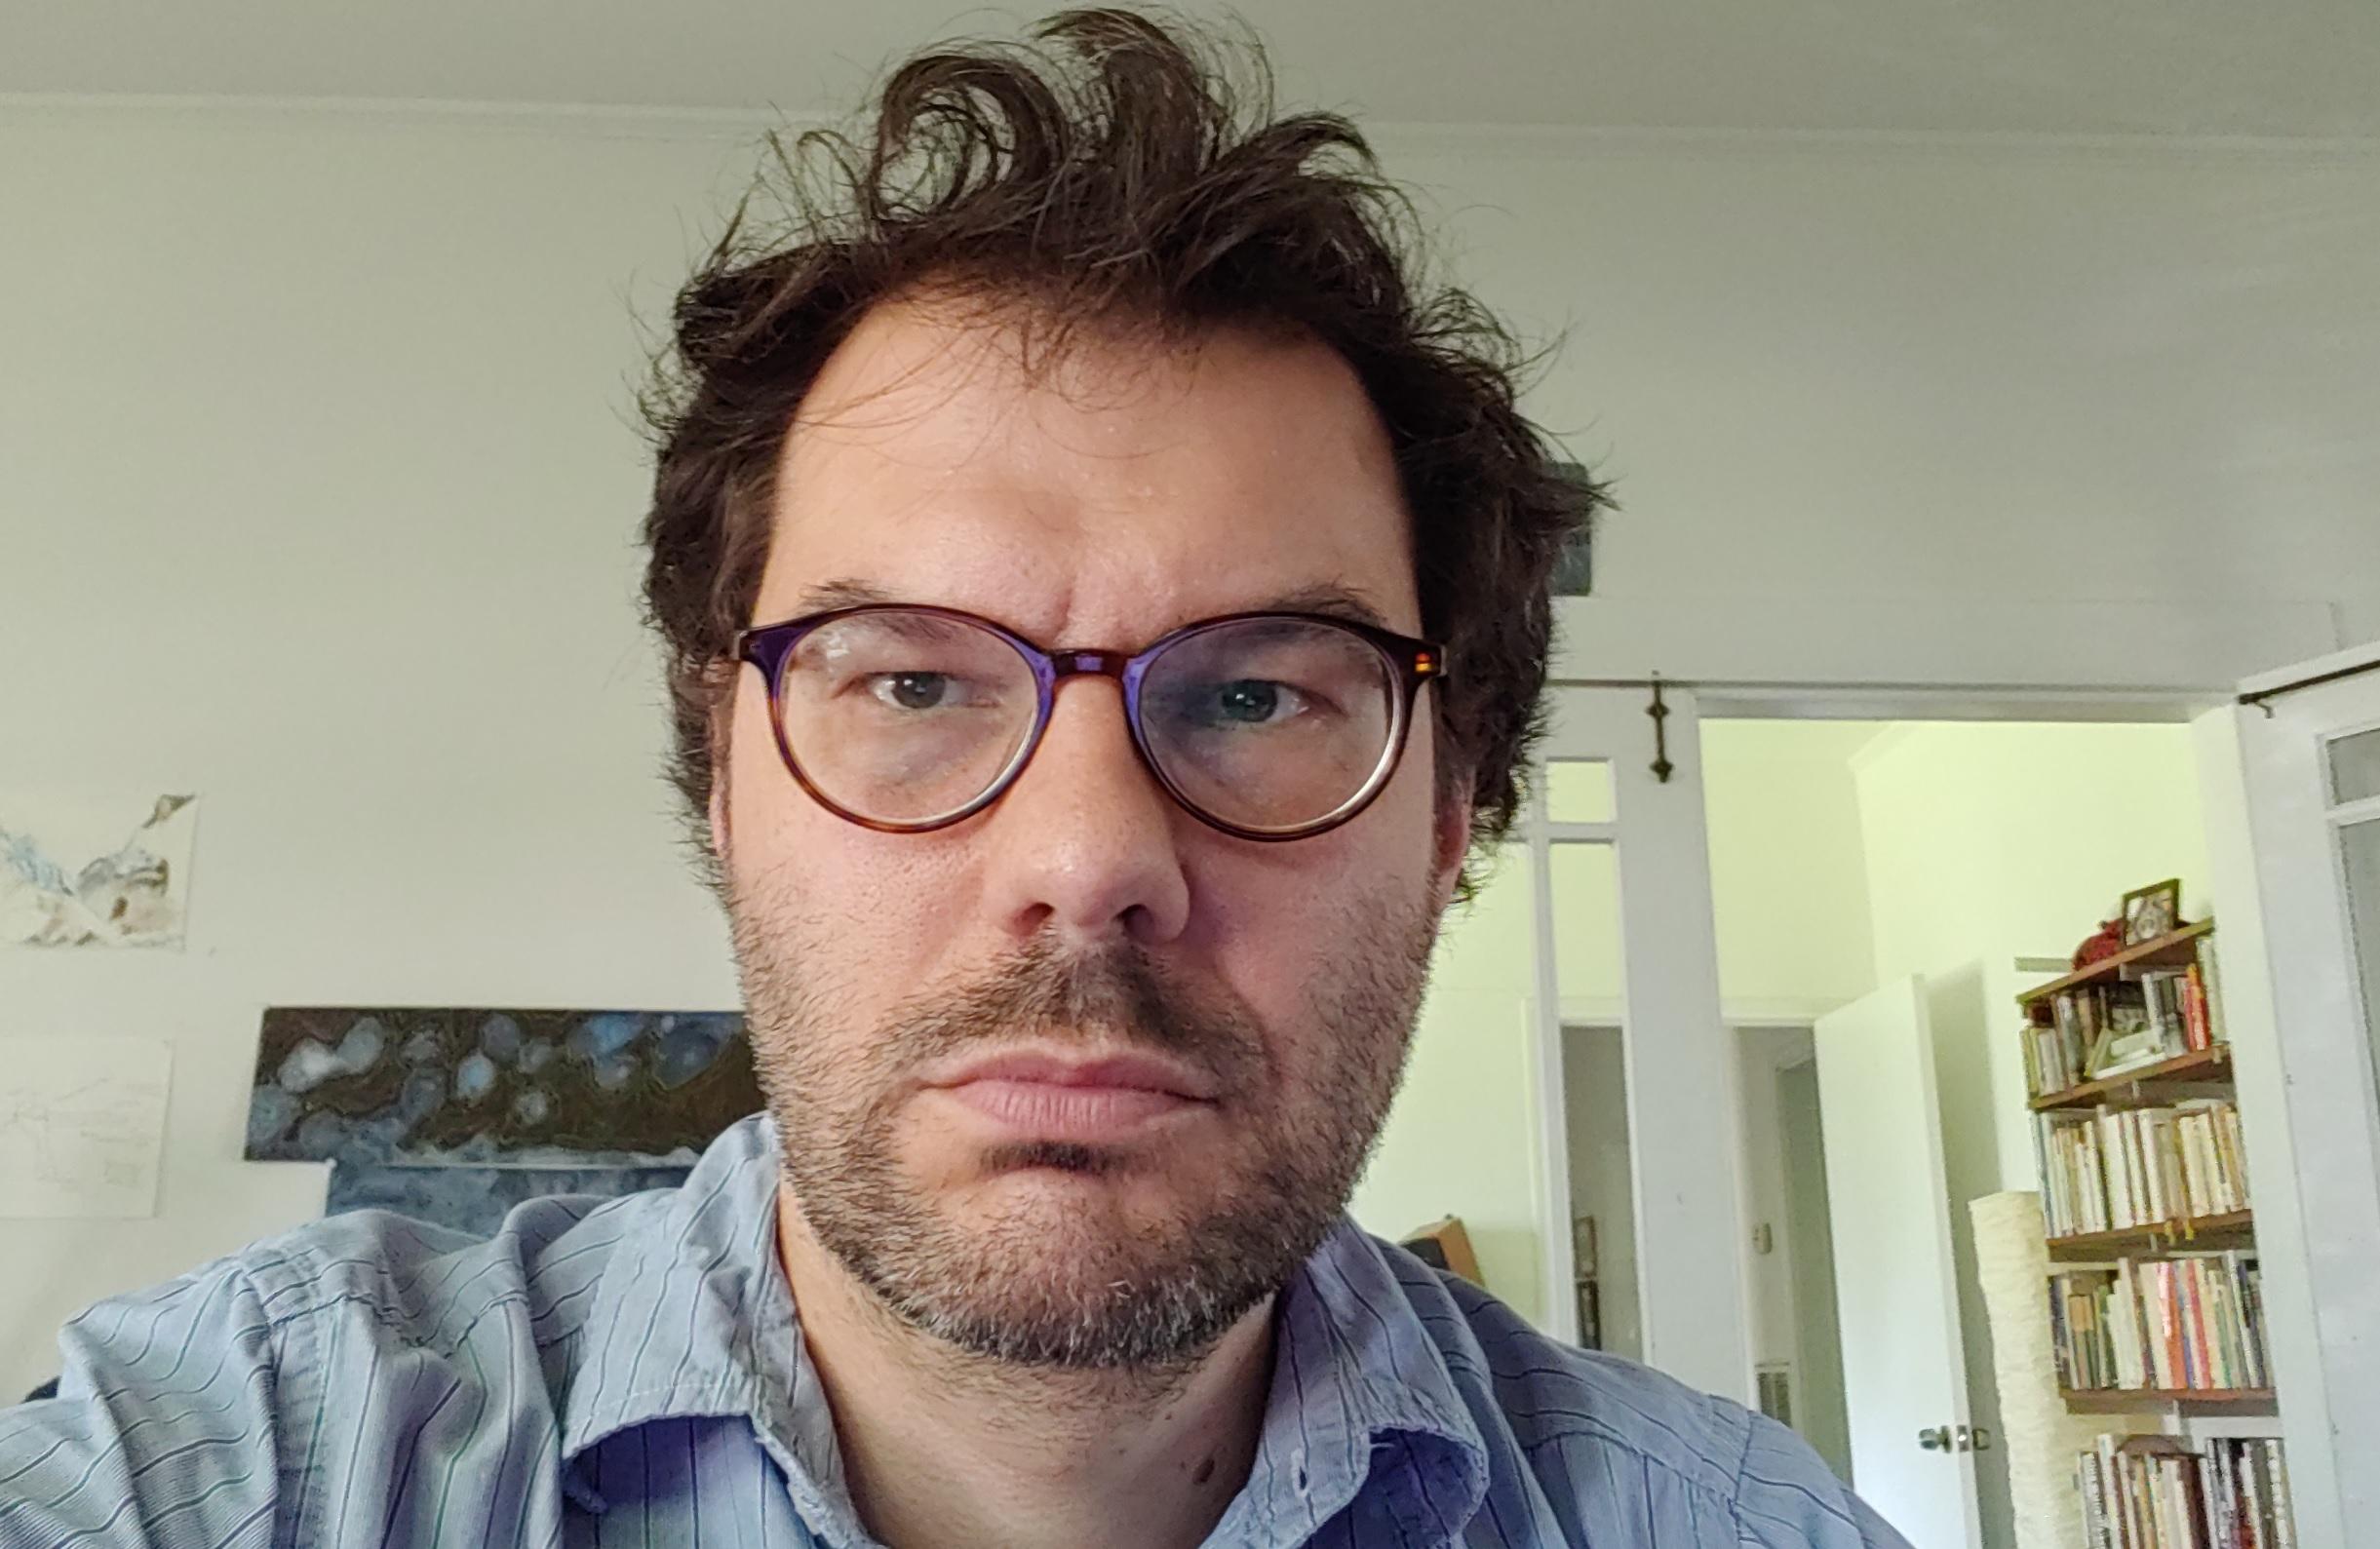 Professor Trépanier